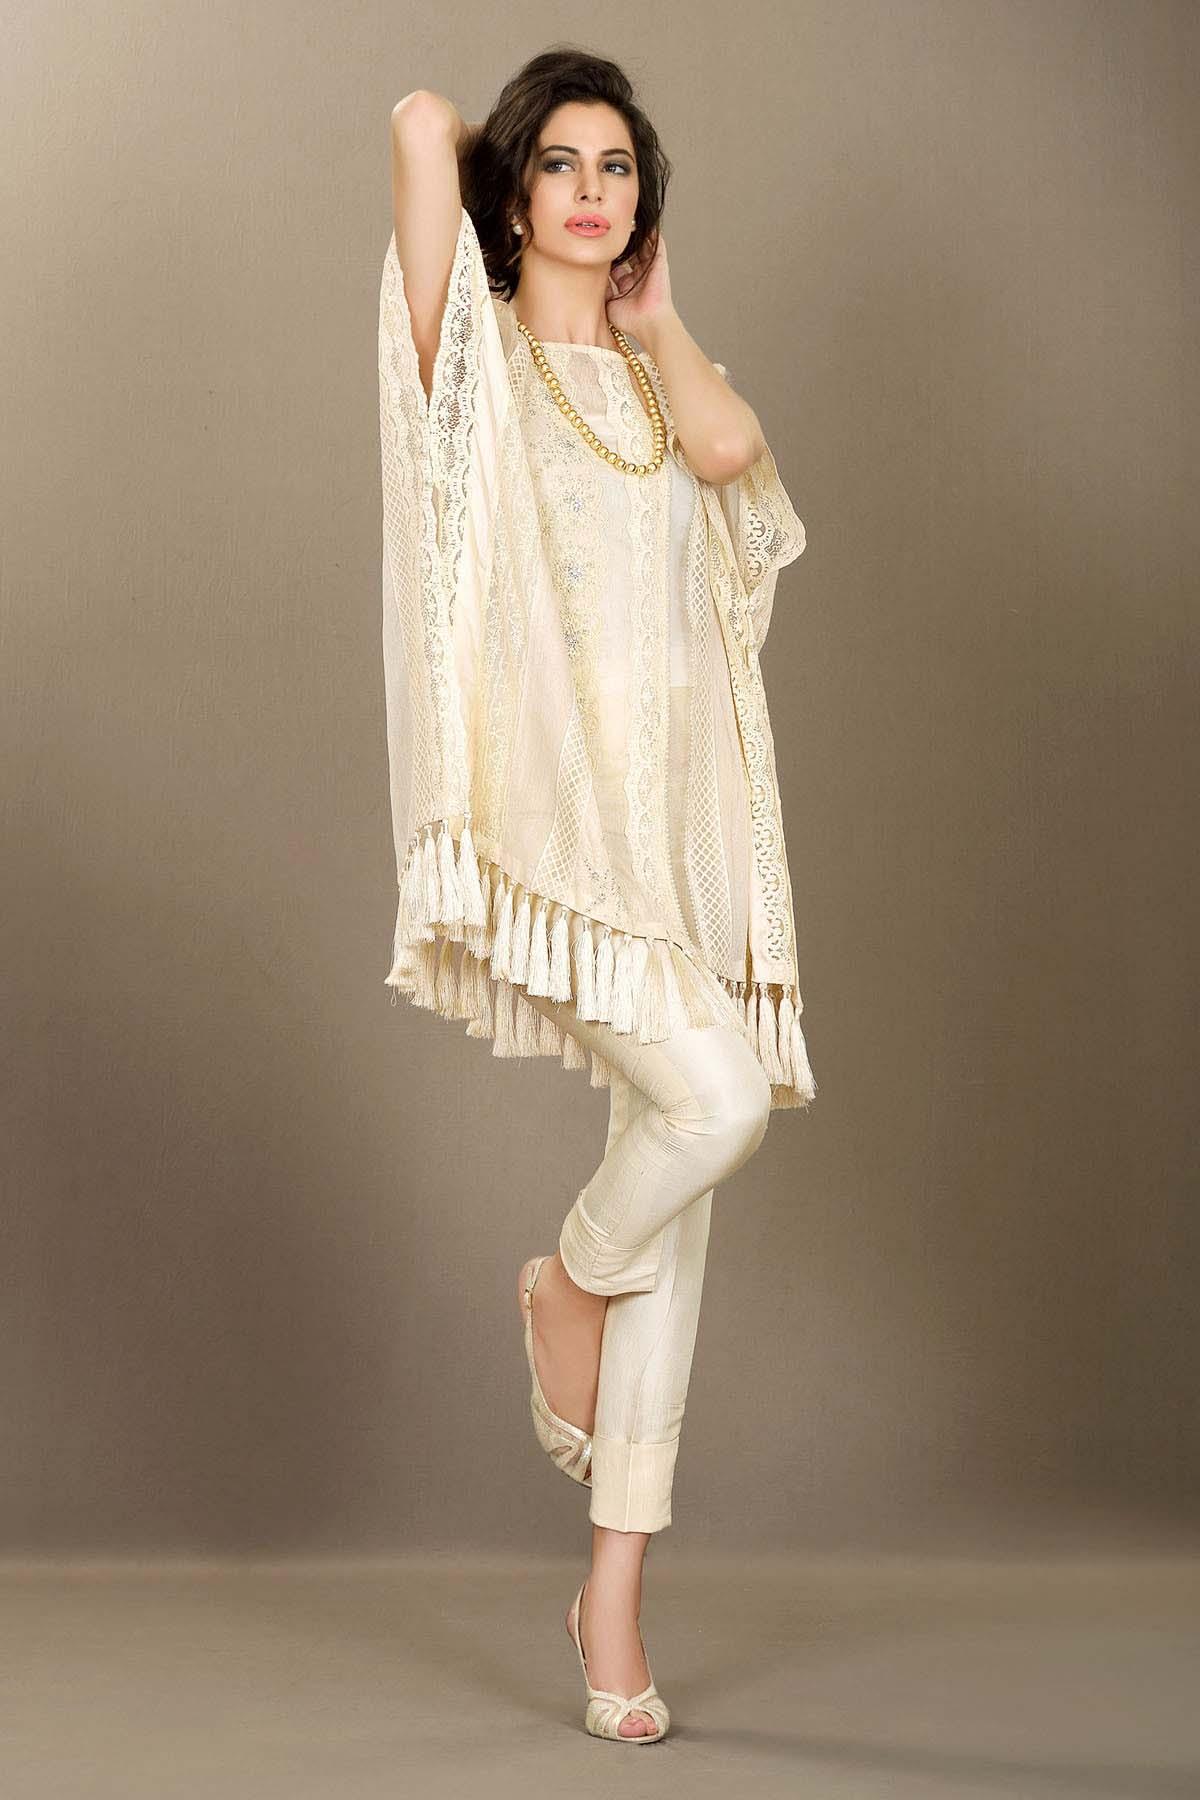 Modern dress of pakistan 2016 - Cape Style Dresses For Women By Pakistani Designers 2016 2017 1